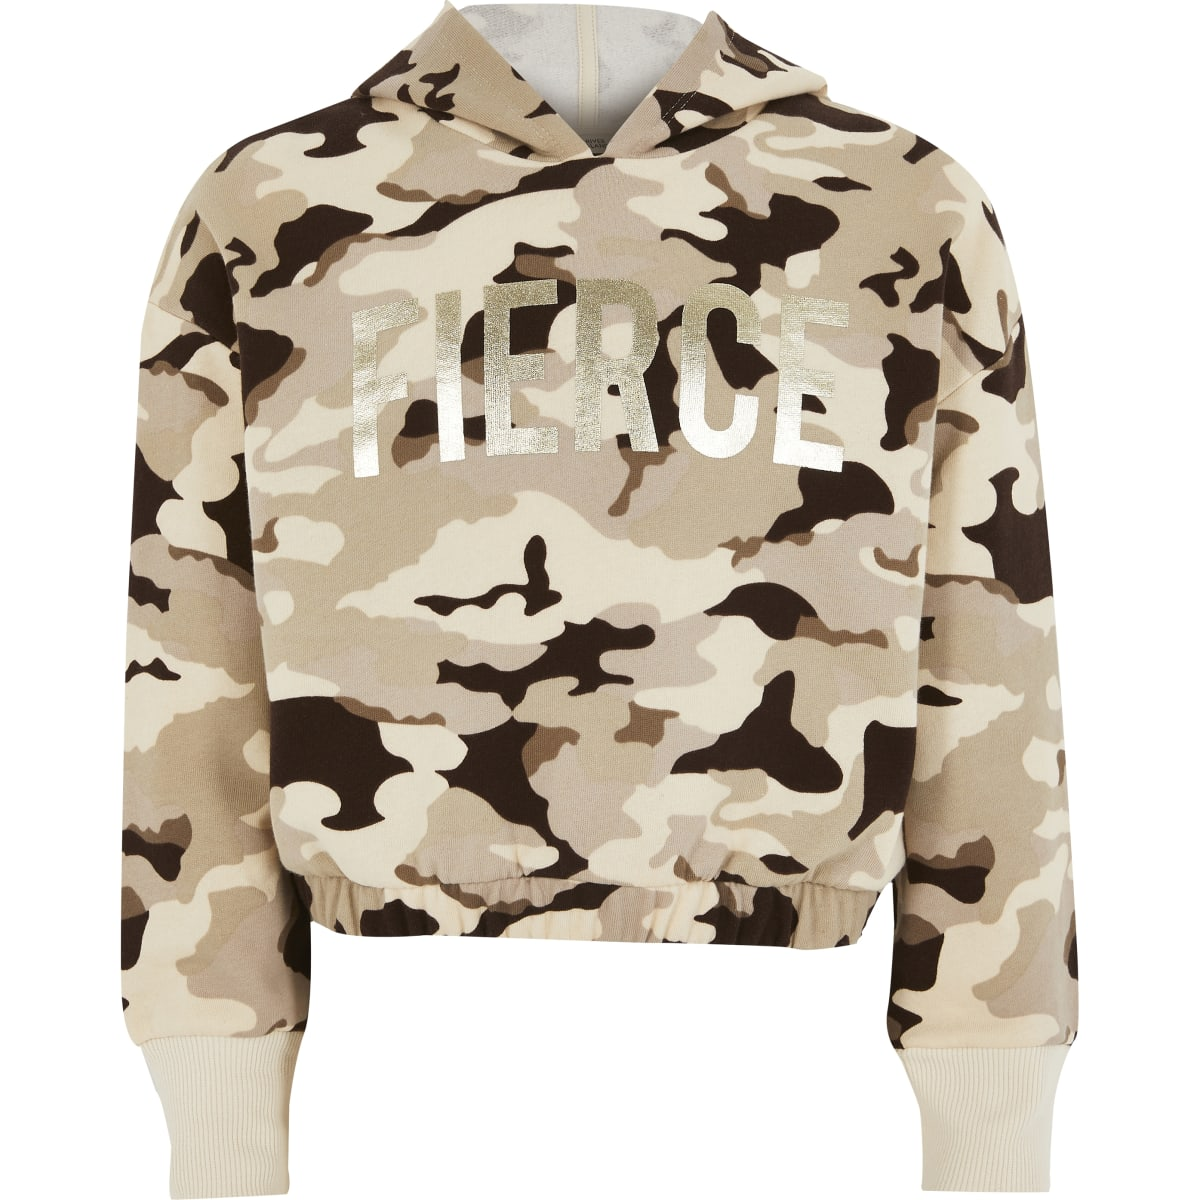 Bruine hoodie met camouflageprint en 'Fierce'-folieprint voor meisjes